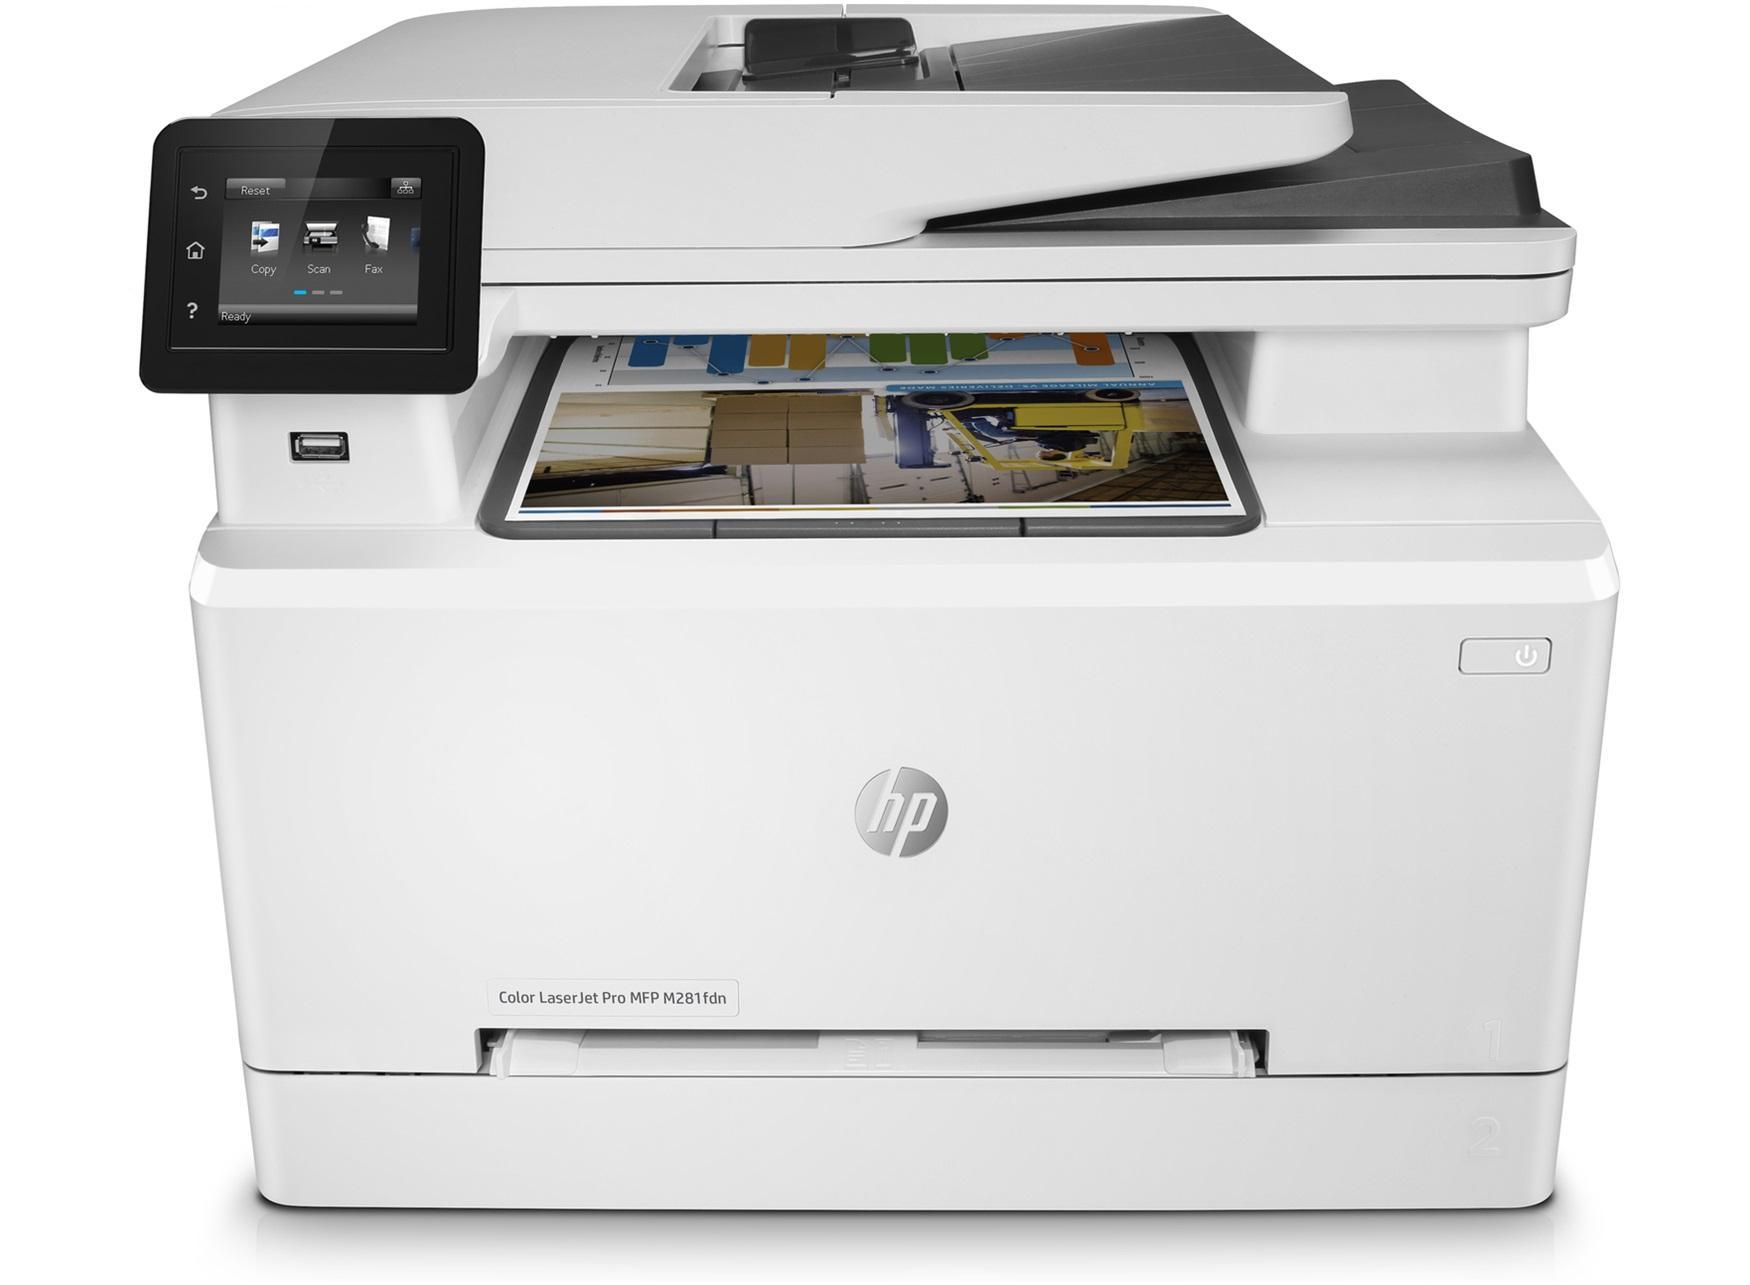 HP PRINTER LASERJET PRO MFP M281FDN ALL-IN-ONE FAKS DUPLEX NETWORK COLOR (T6B81A)